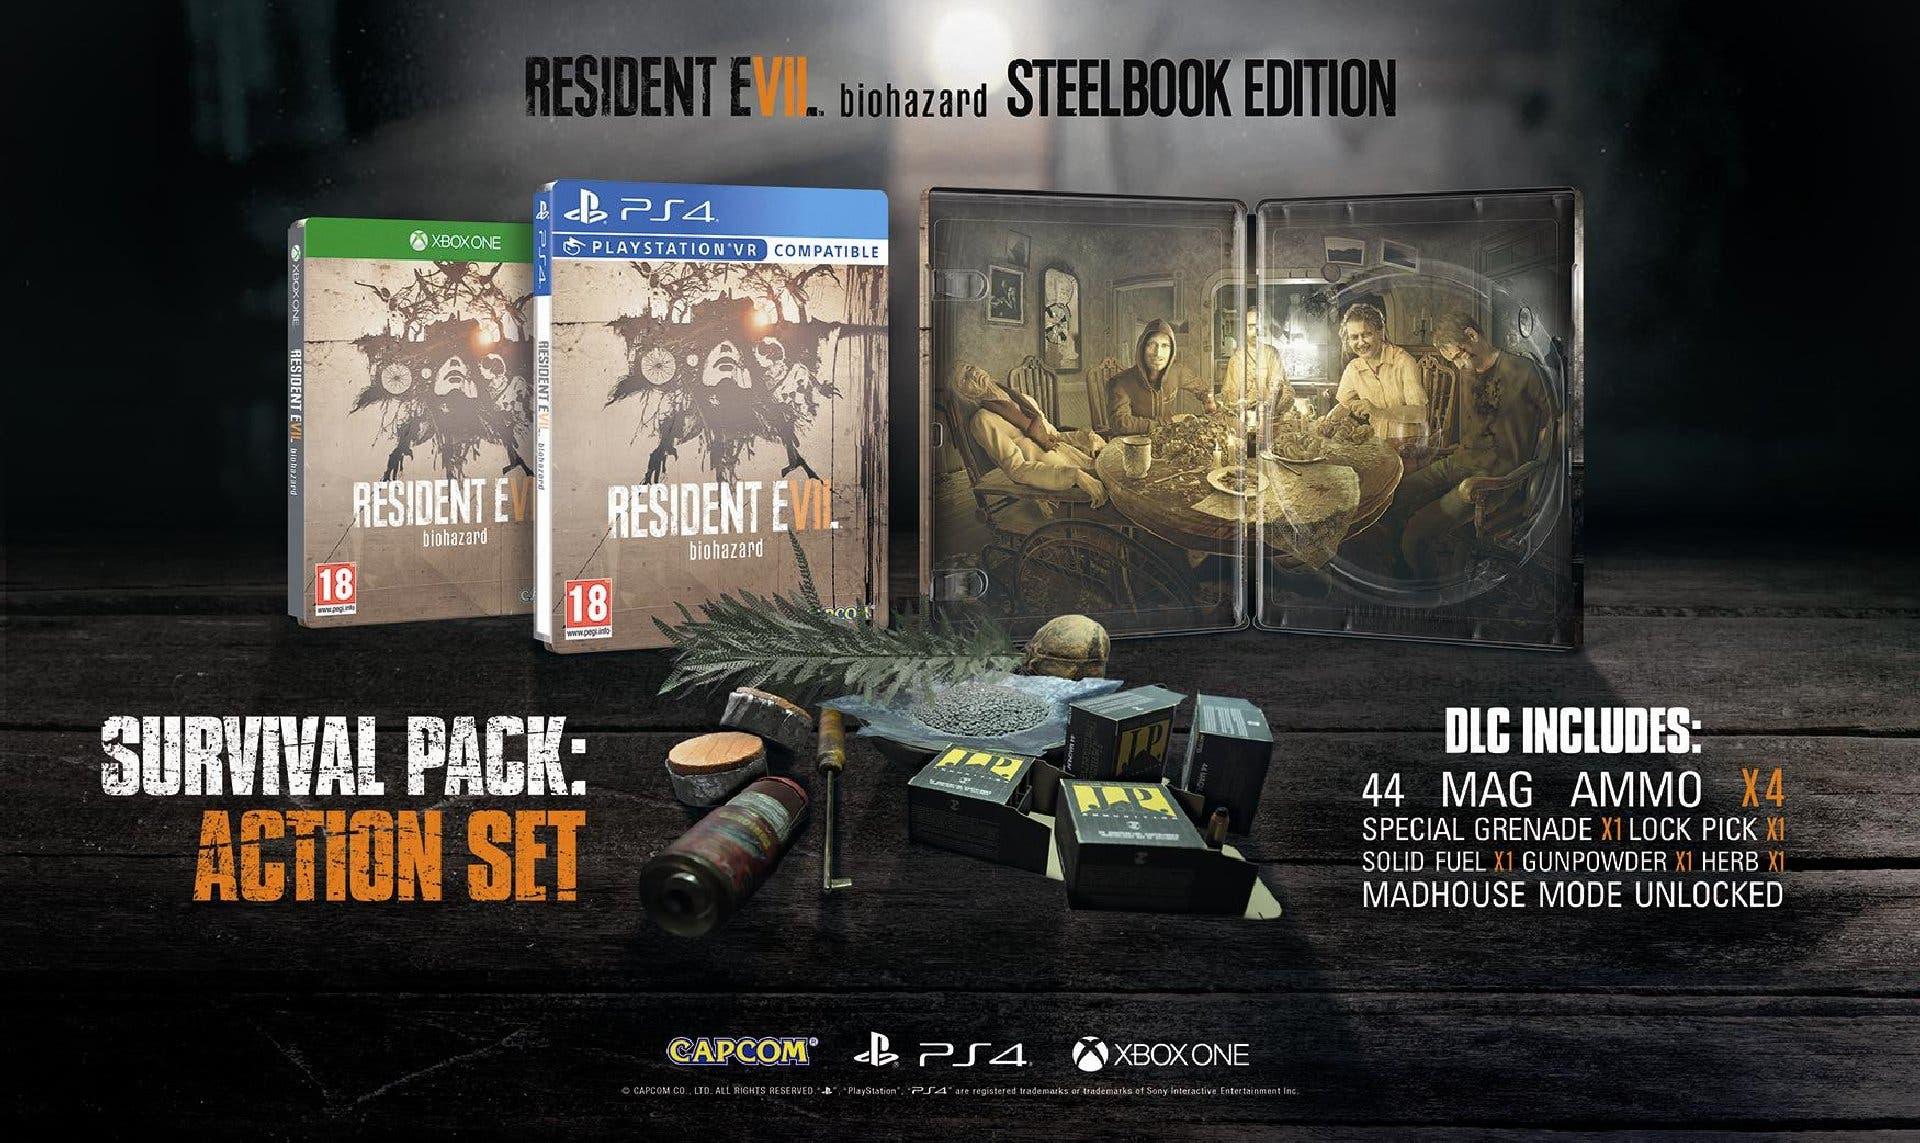 Steelbook Edition Resident Evil 7